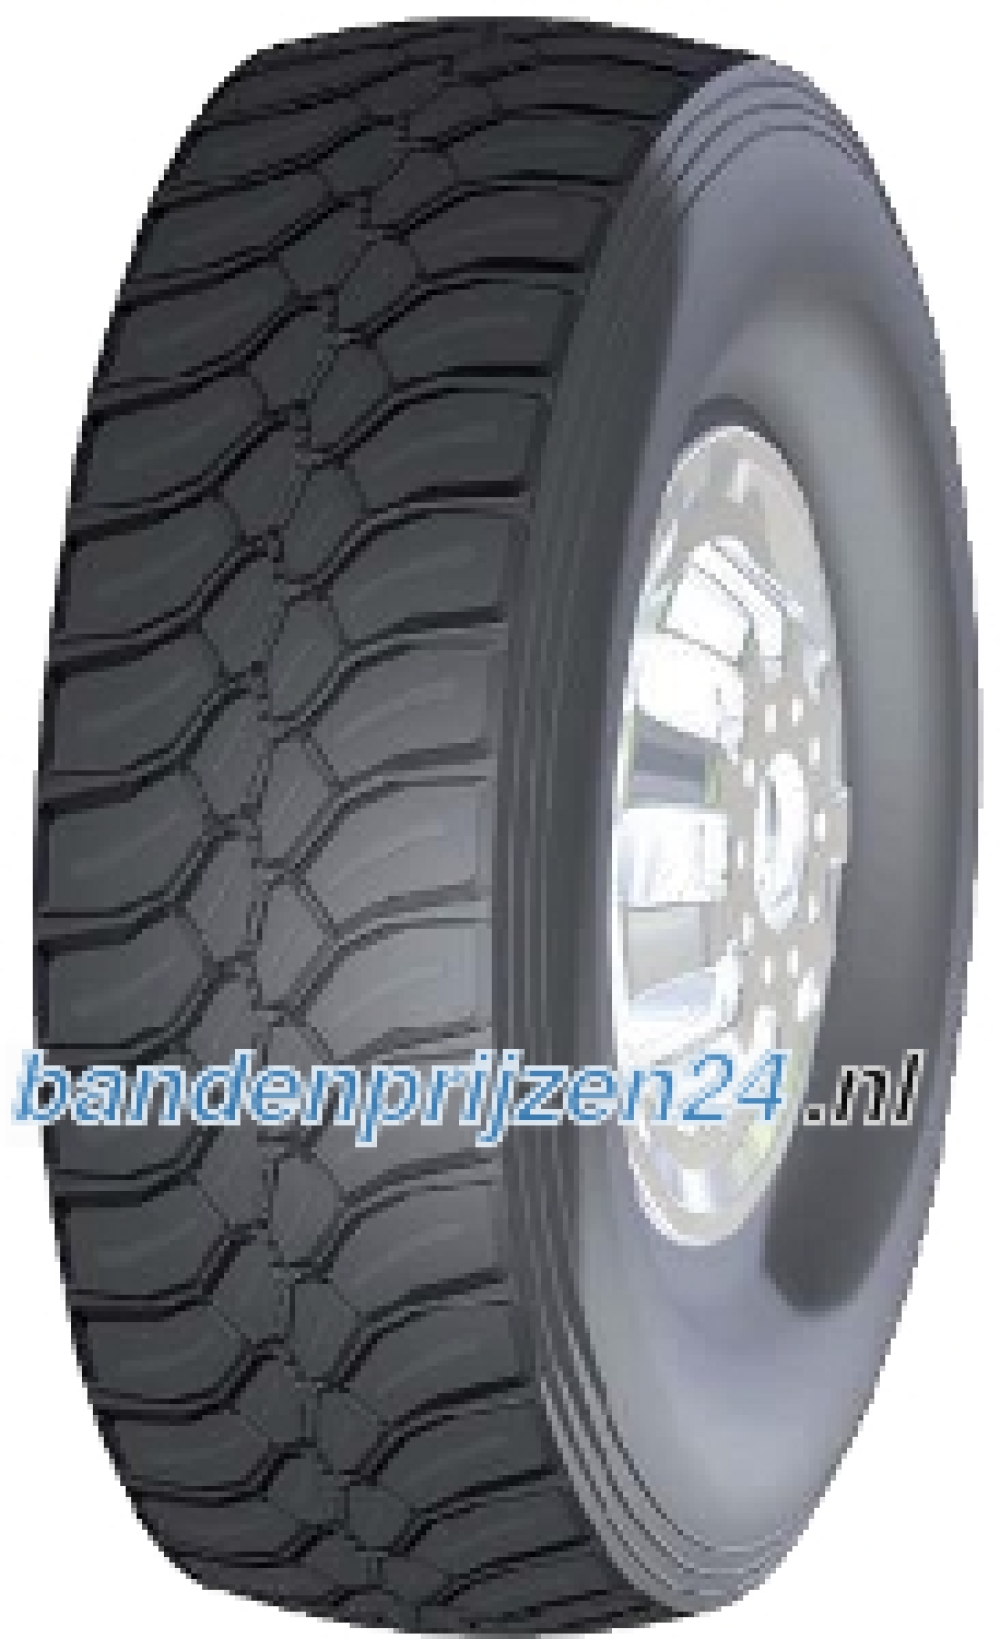 Kaltrunderneuerung K228 ( 315/80 R22.5 154/150K cover, Karkassqualität NV )